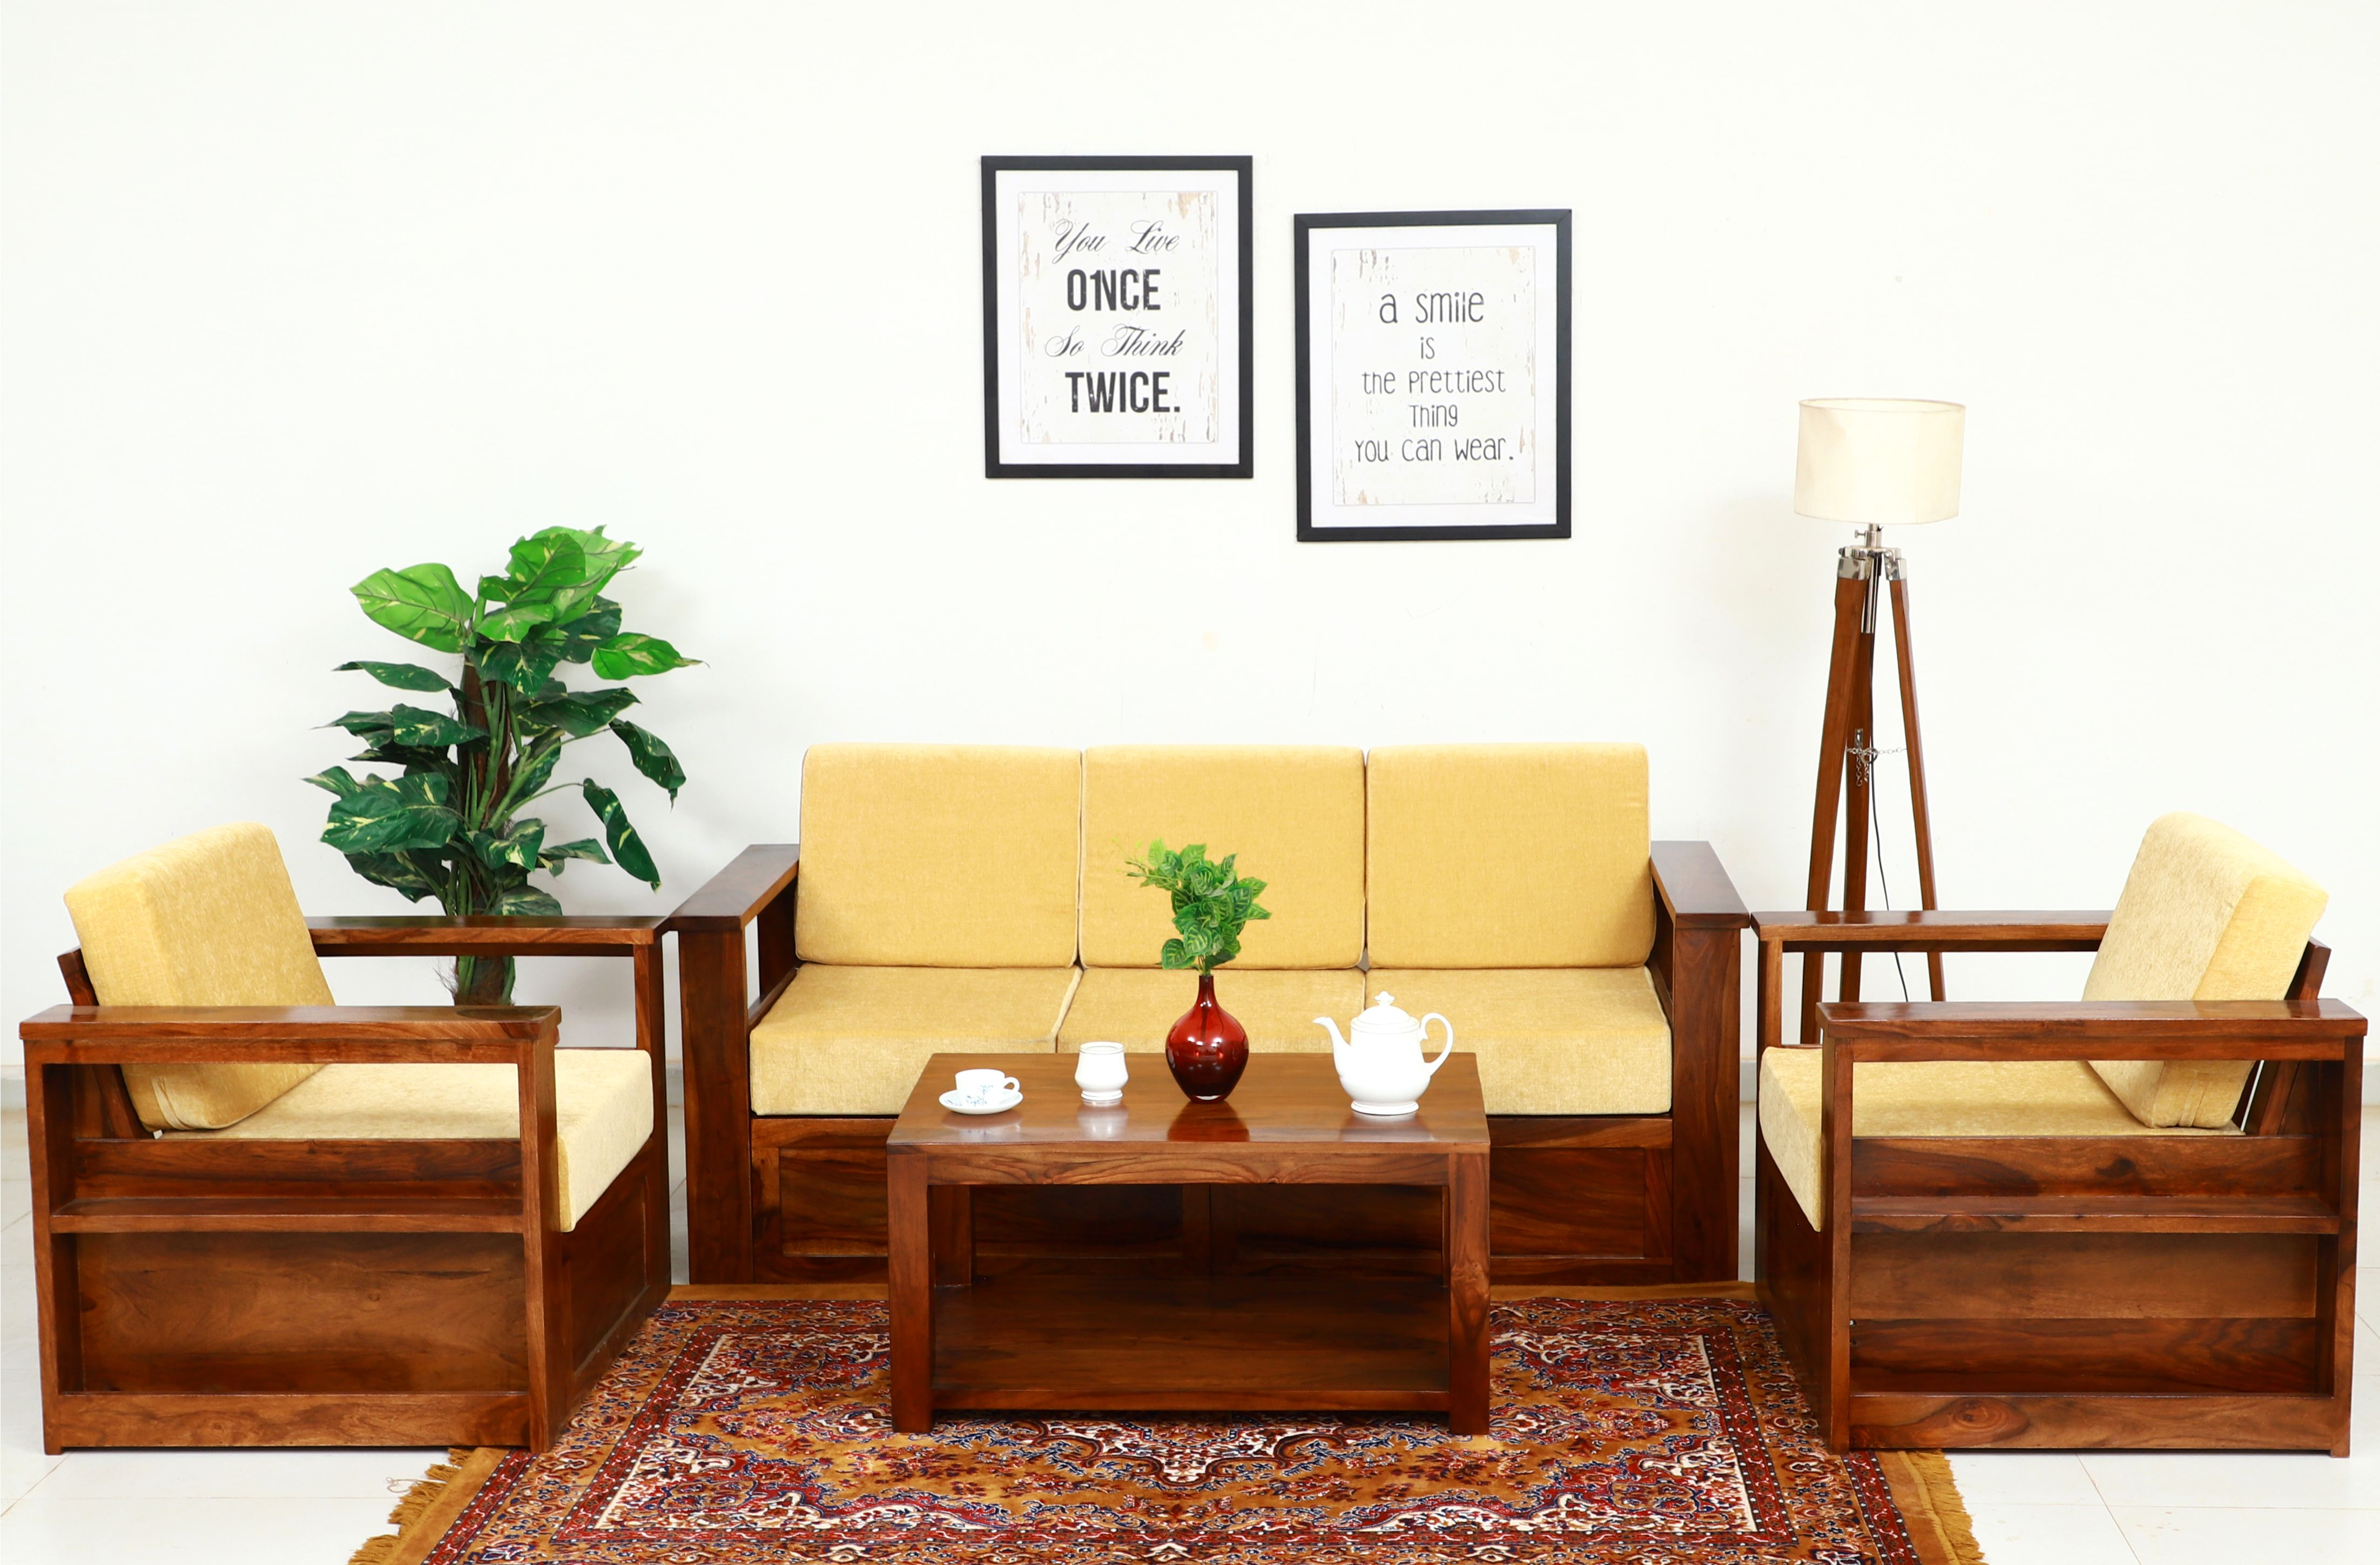 Wooden Sofa Set Buy Wooden Sofa Set Online At Best Prices Jodhpuri Furniture Get Upto 60 Off In 2020 Wooden Sofa Designs Latest Wooden Sofa Designs Furniture